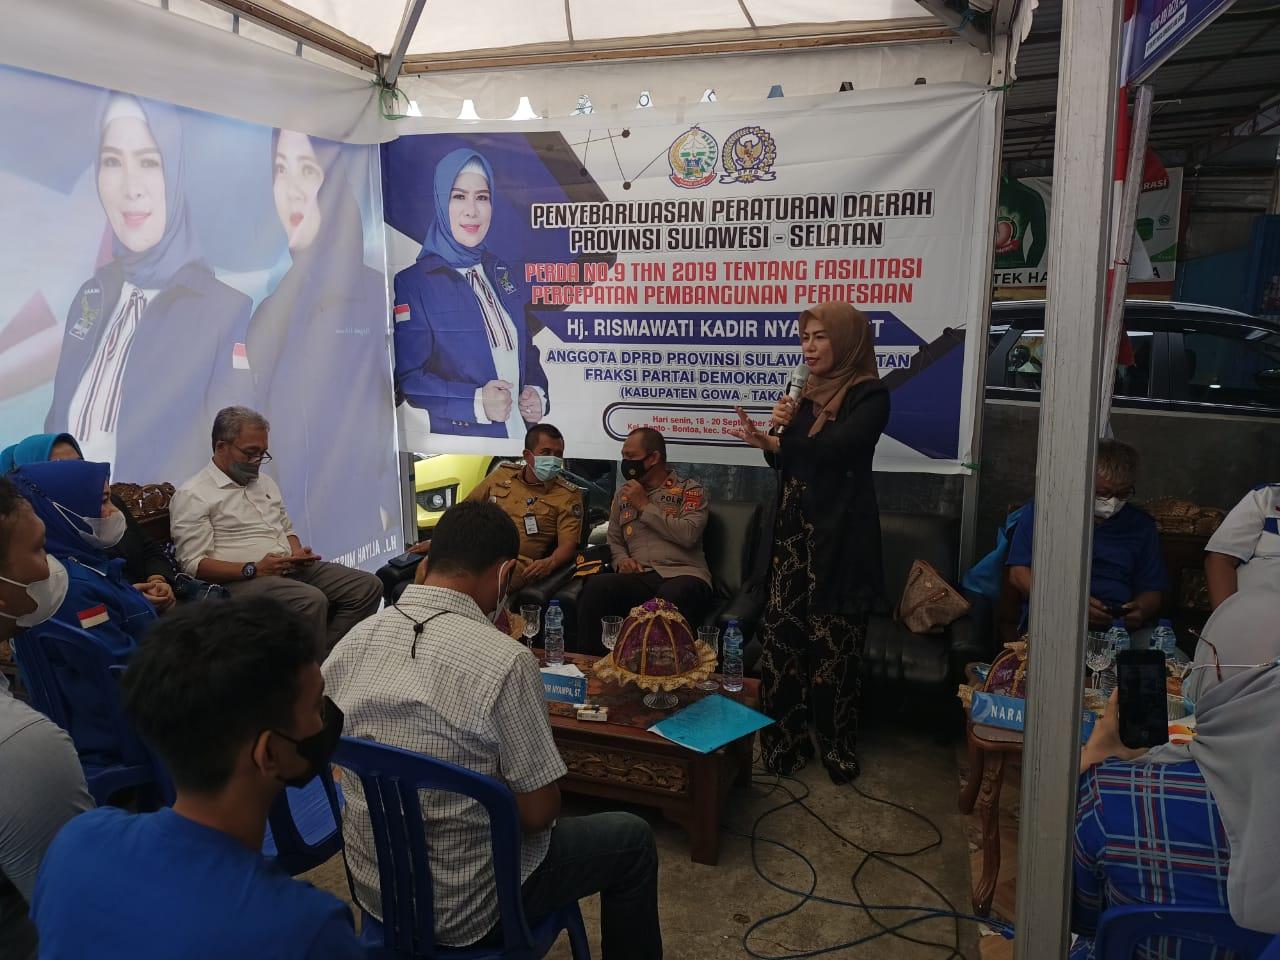 Tripika Somba Opu Hadiri Undangan Sosialisasi Perda No.9 Tahun 2019 Oleh Anggota DPRD Provinsi Sulsel